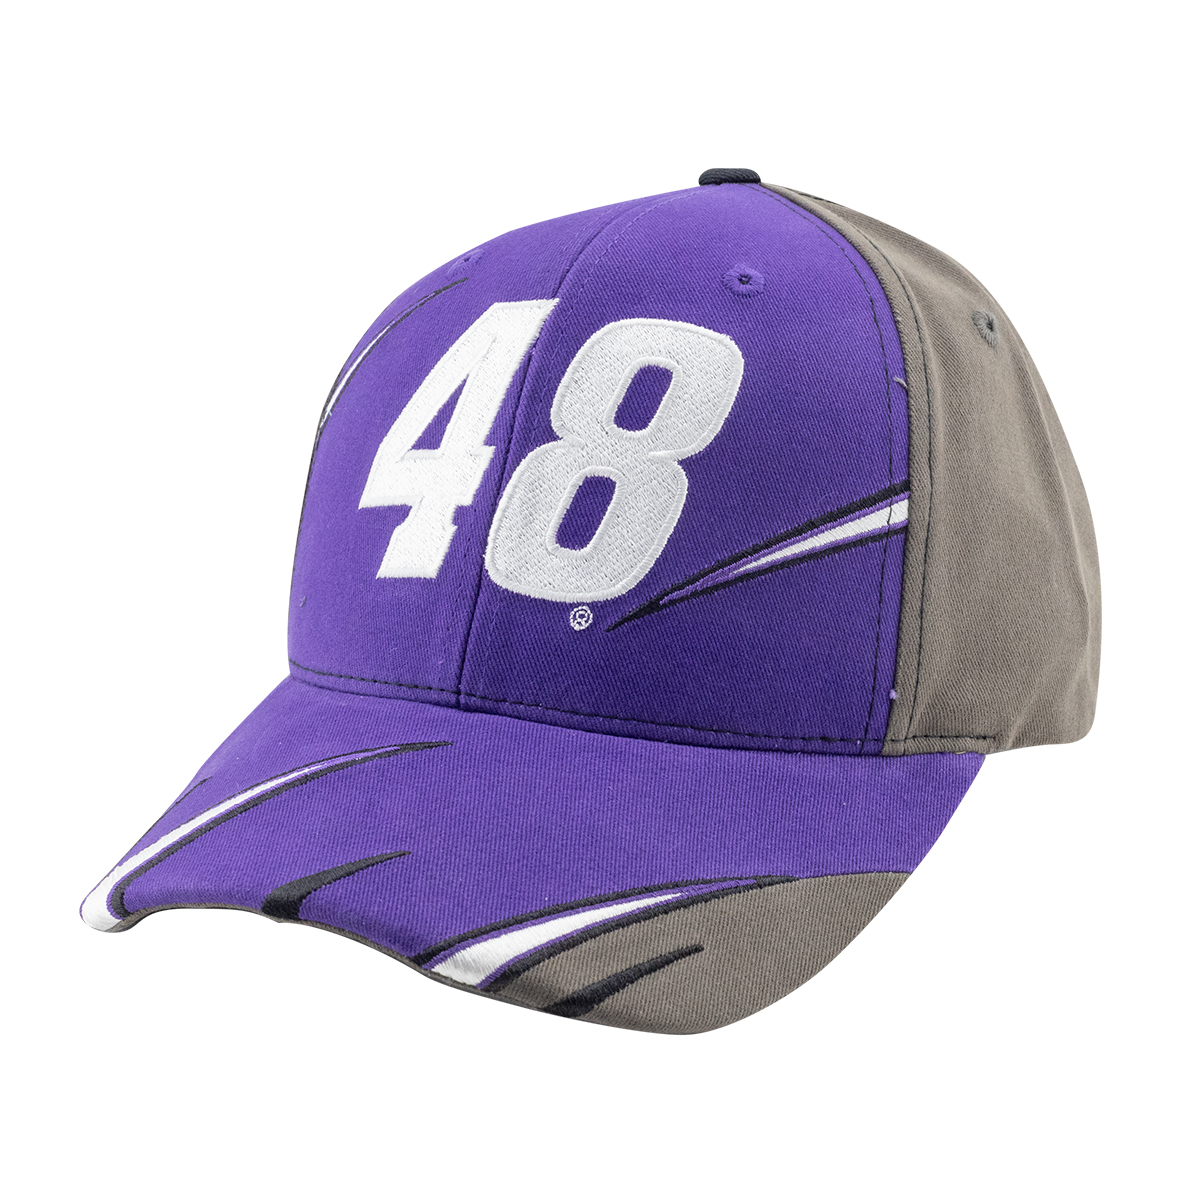 Alex Bowman NASCAR 2021 #48 Adult Electrifying Hat